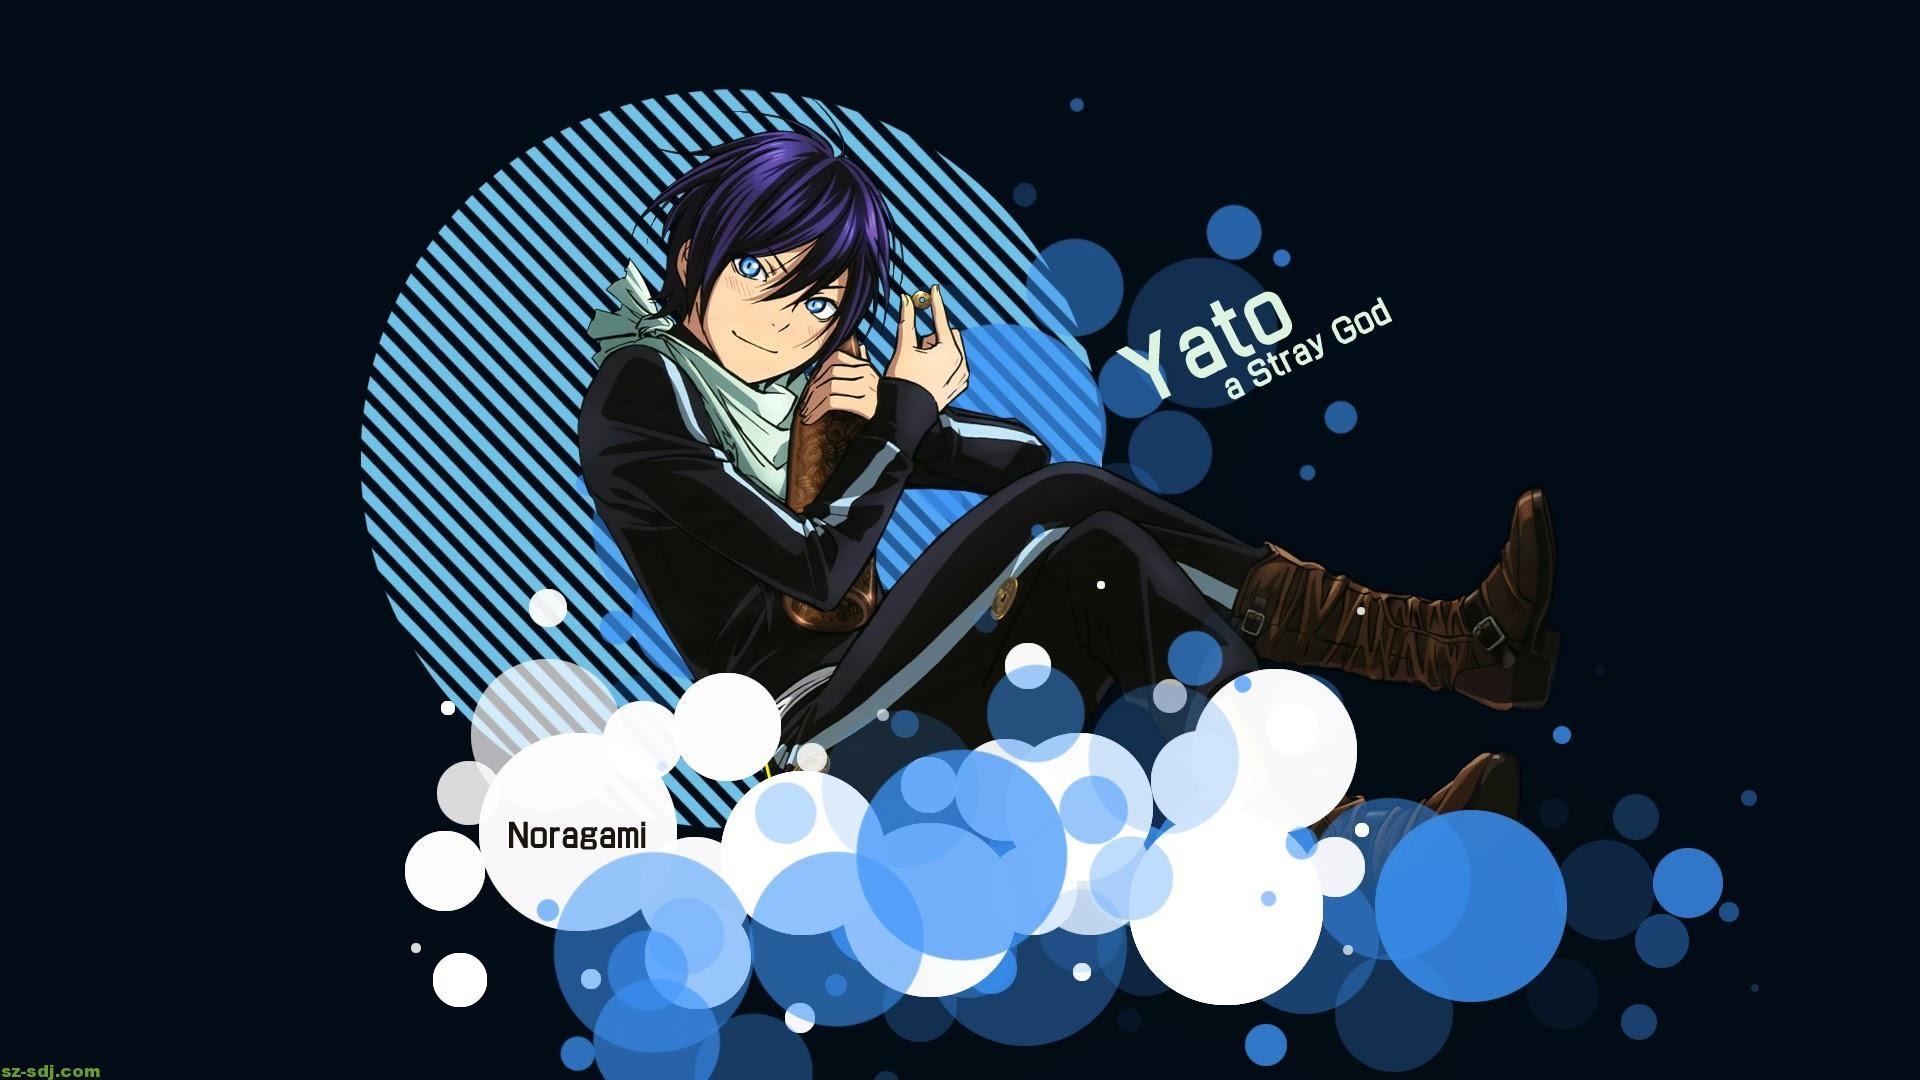 Yato background Anime Noragami Aragoto Wallpaper HD 2015